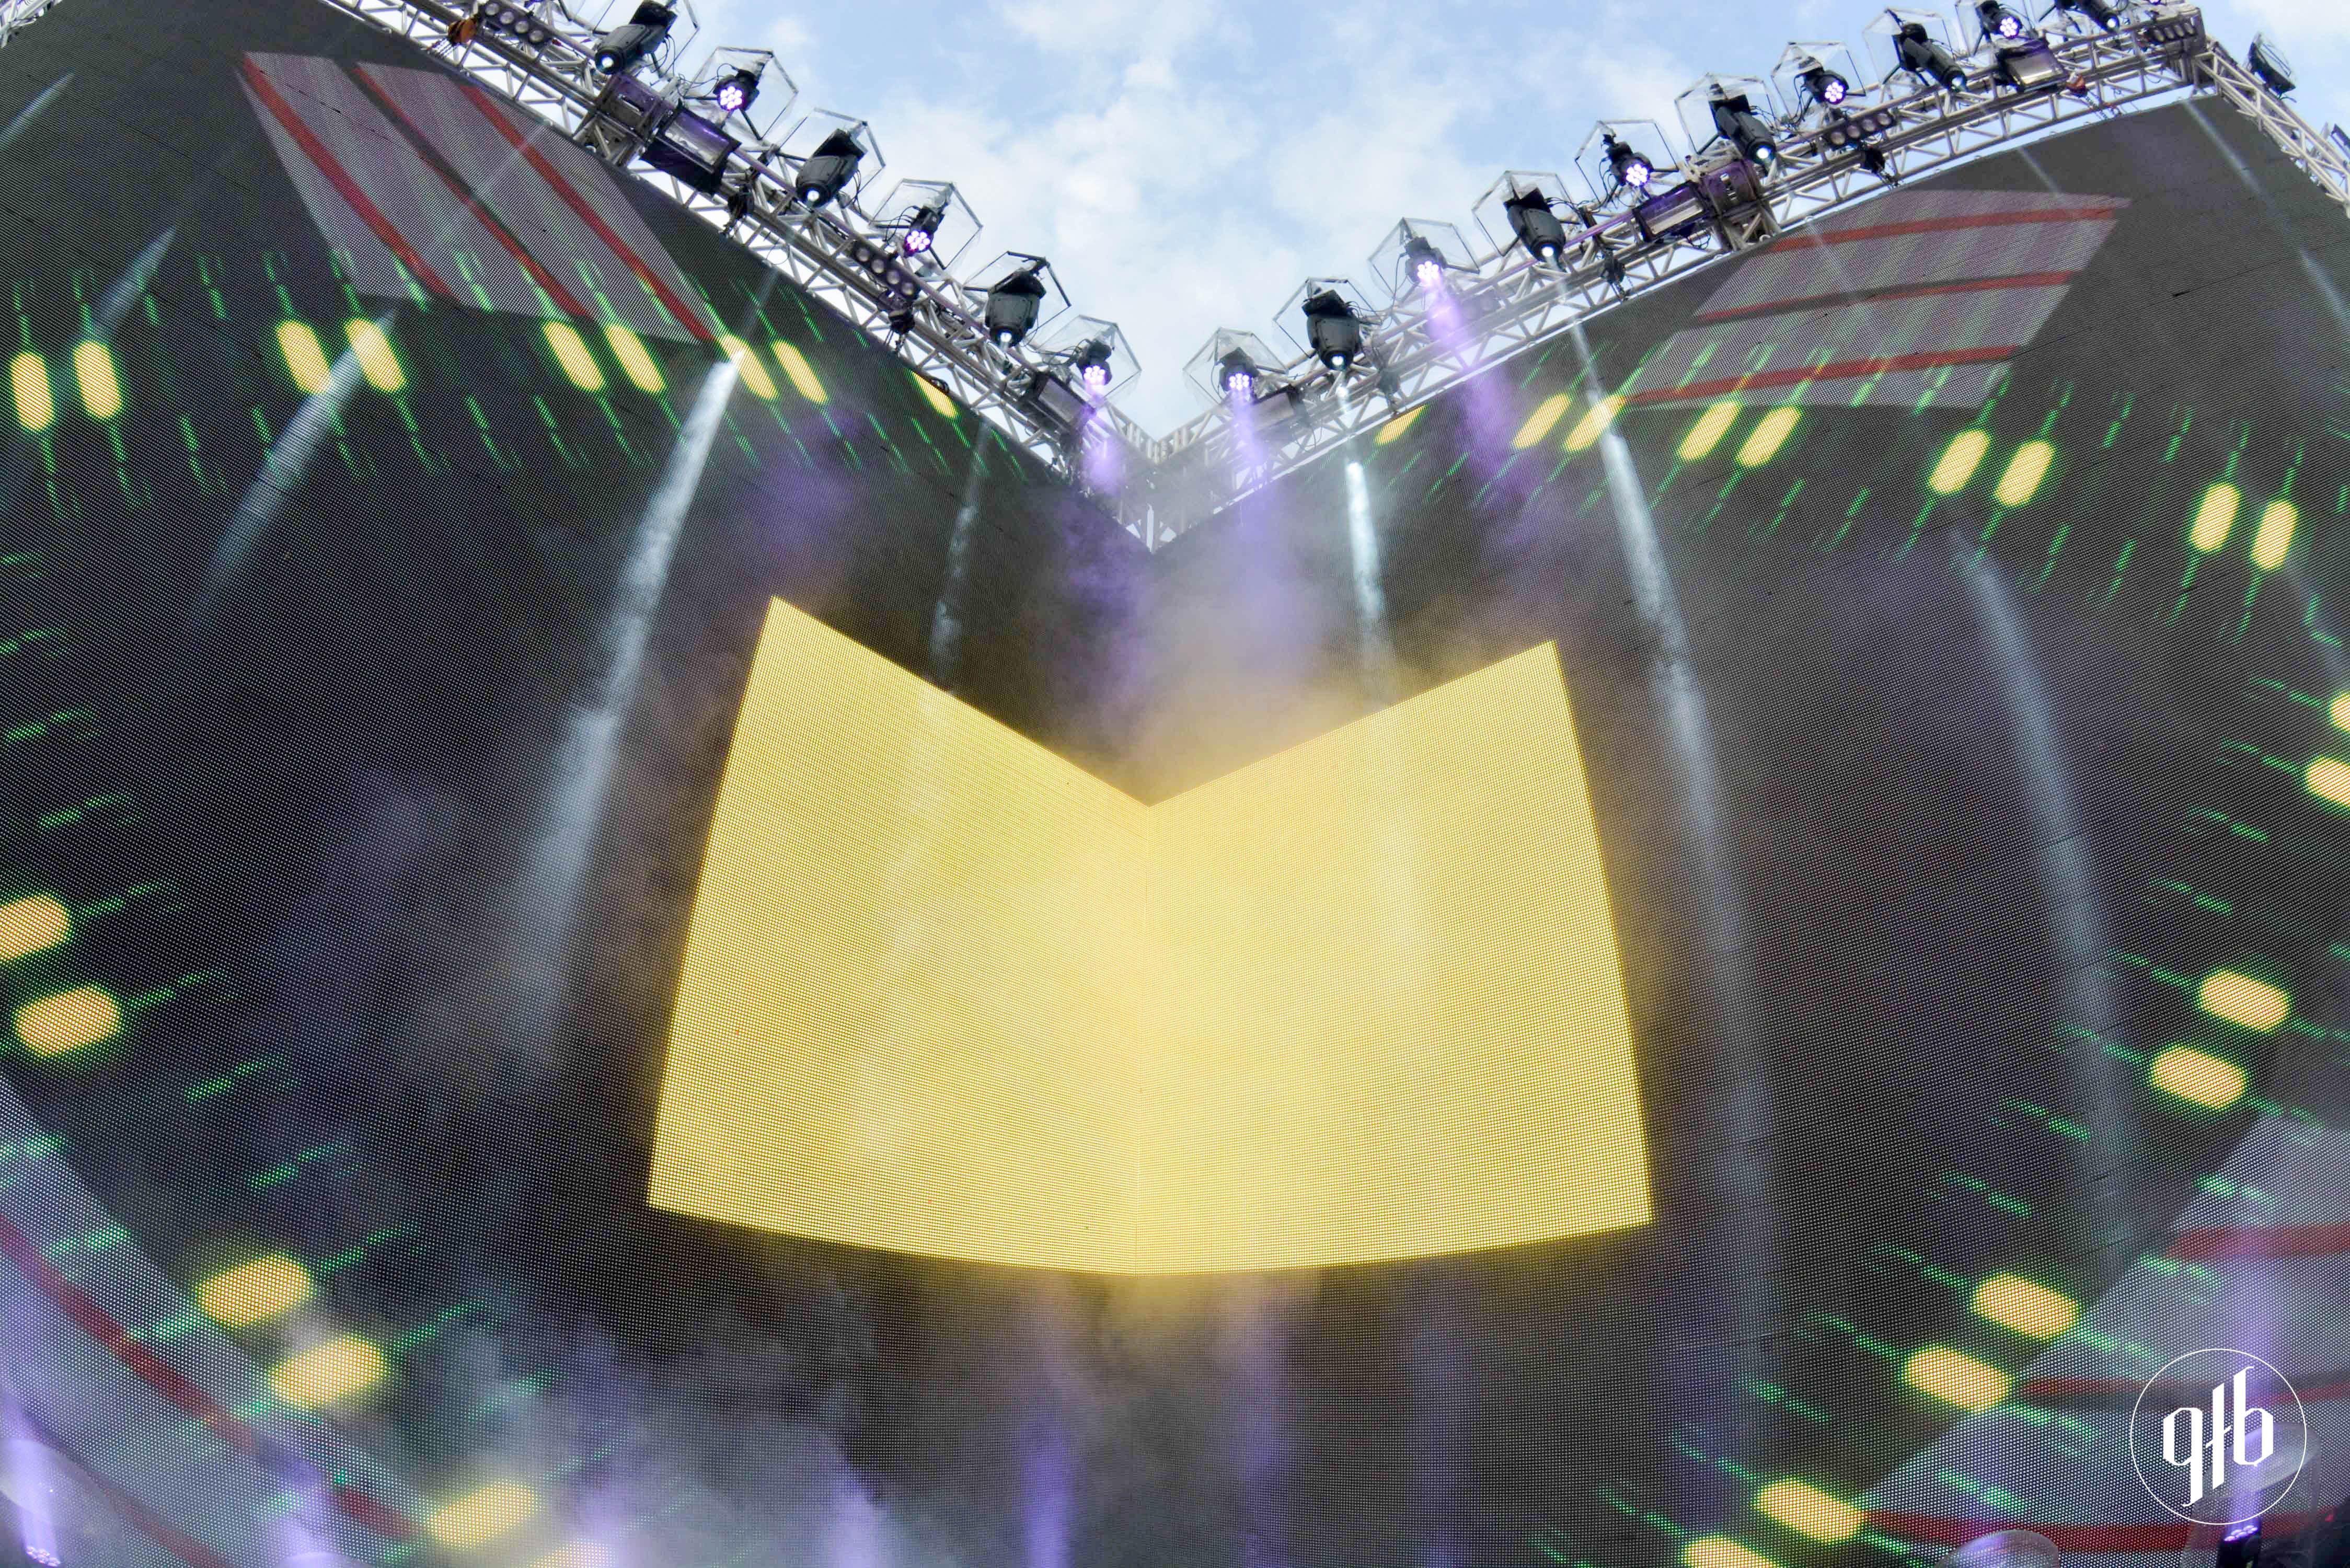 SÓ TRACK BOA – Carnaval Eletrônico – Complexo Jequitimar 06/02